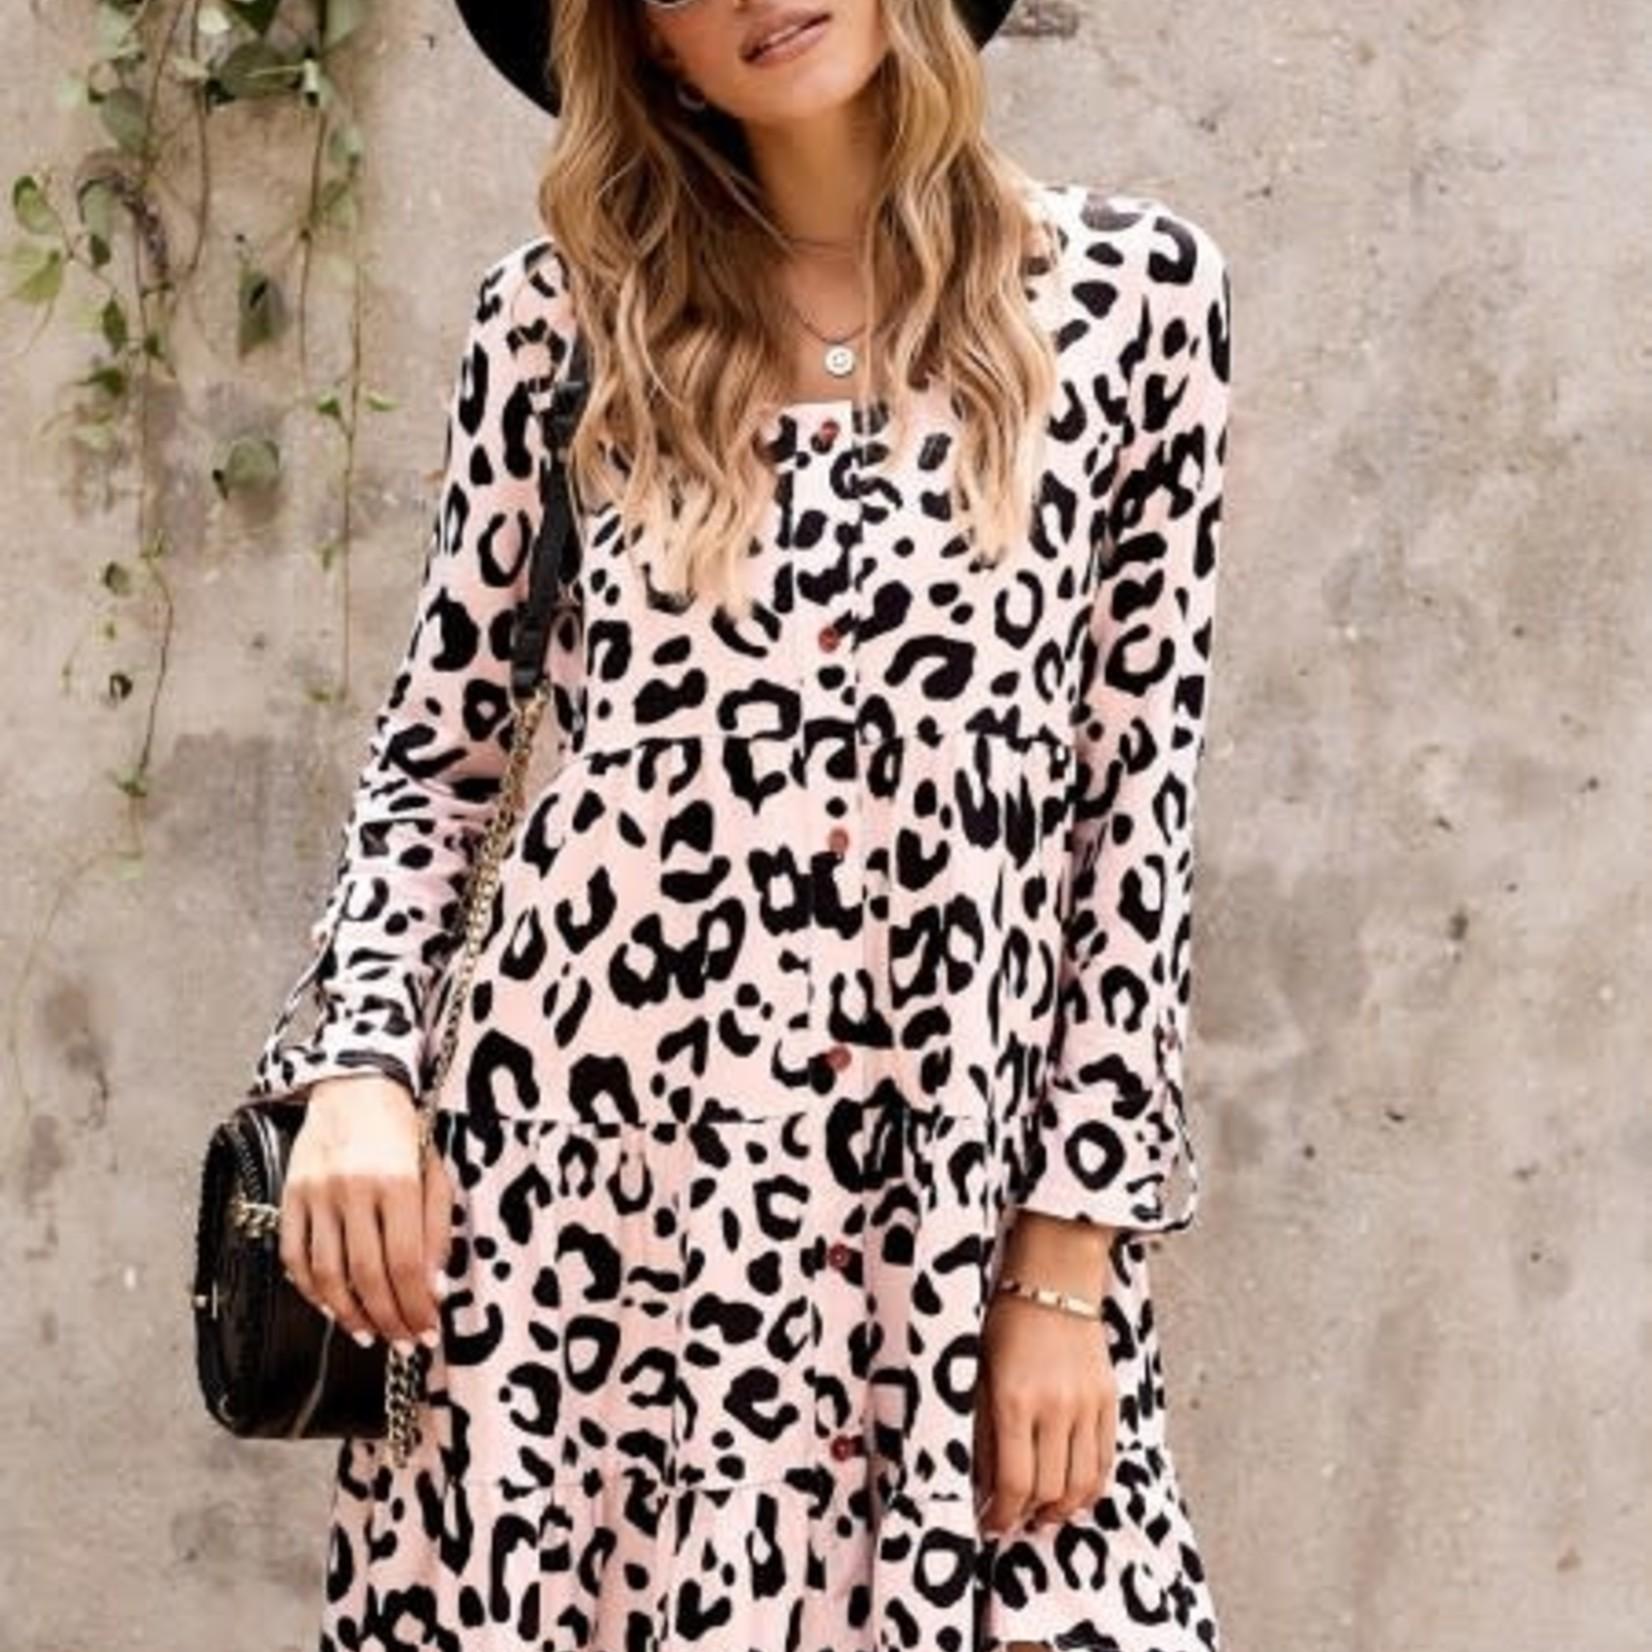 Miss Sparkling Leopard Tiered Babydoll Dress